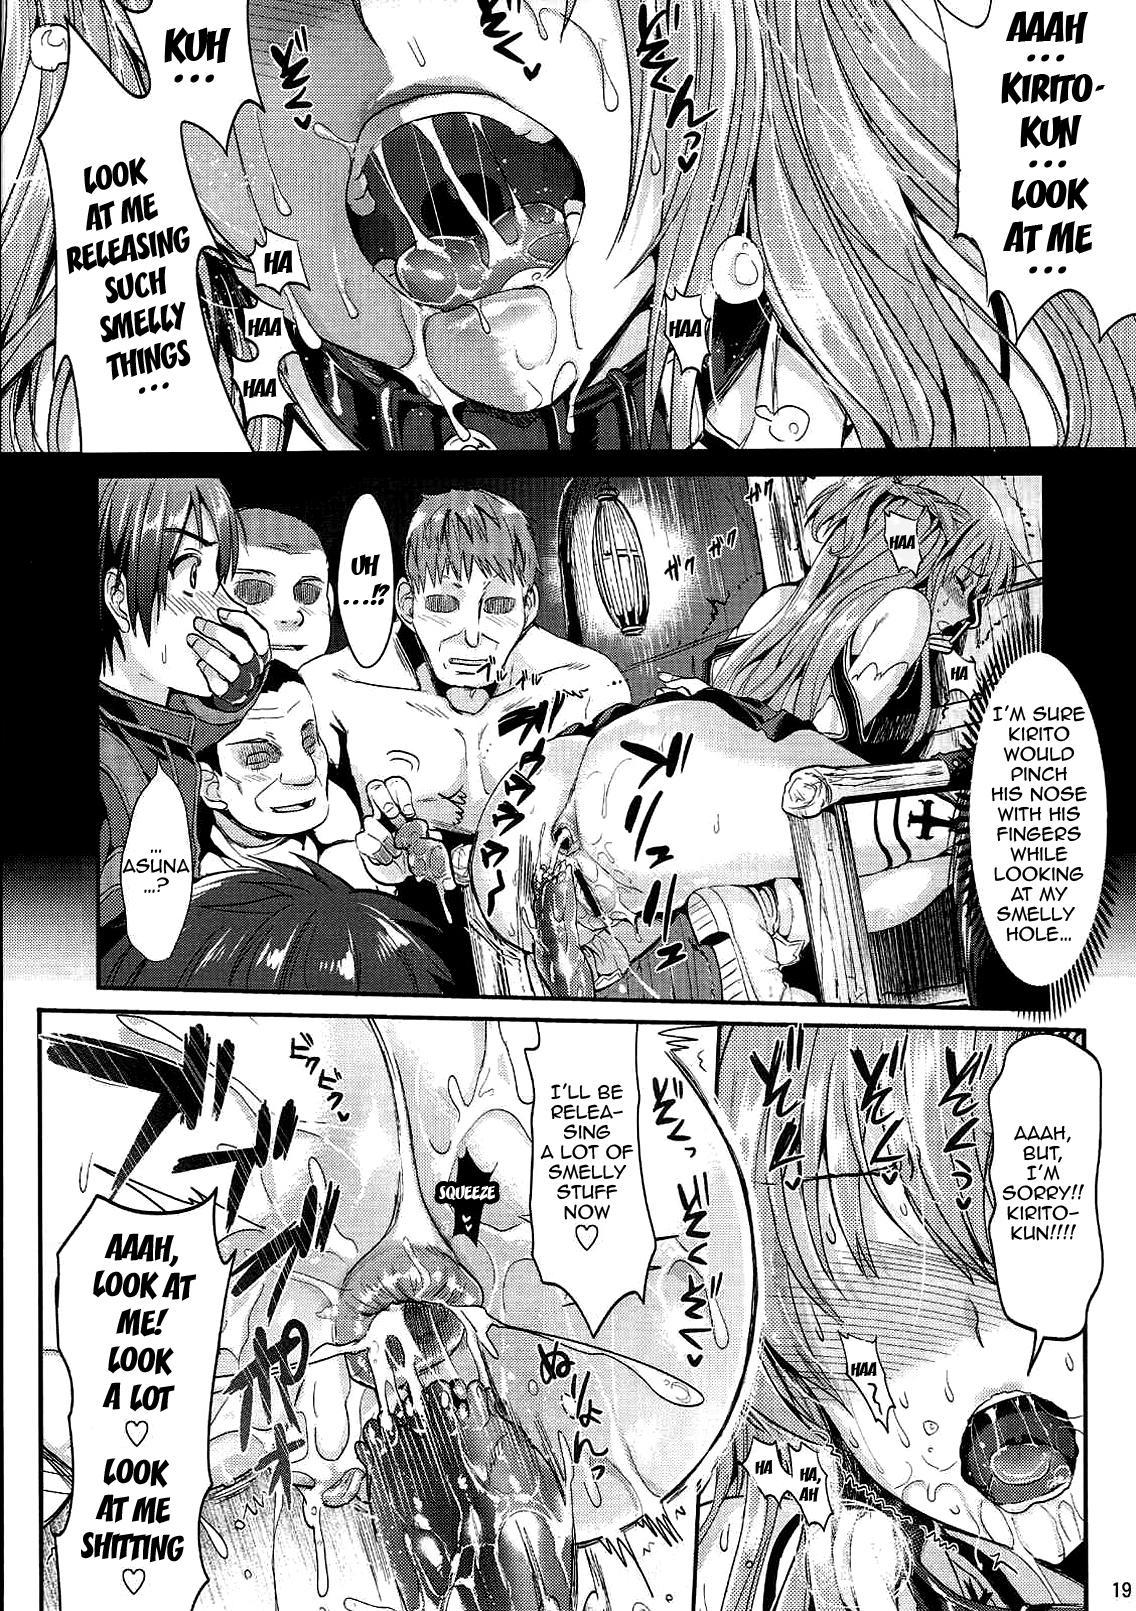 [YURIRU-RARIKA (Kojima Saya, Lazu)] Shujou Seikou 2 Bangai-hen | Captive Sex 2 - Extra Chapter (Sword Art Online) [English] {doujin-moe.us} 17